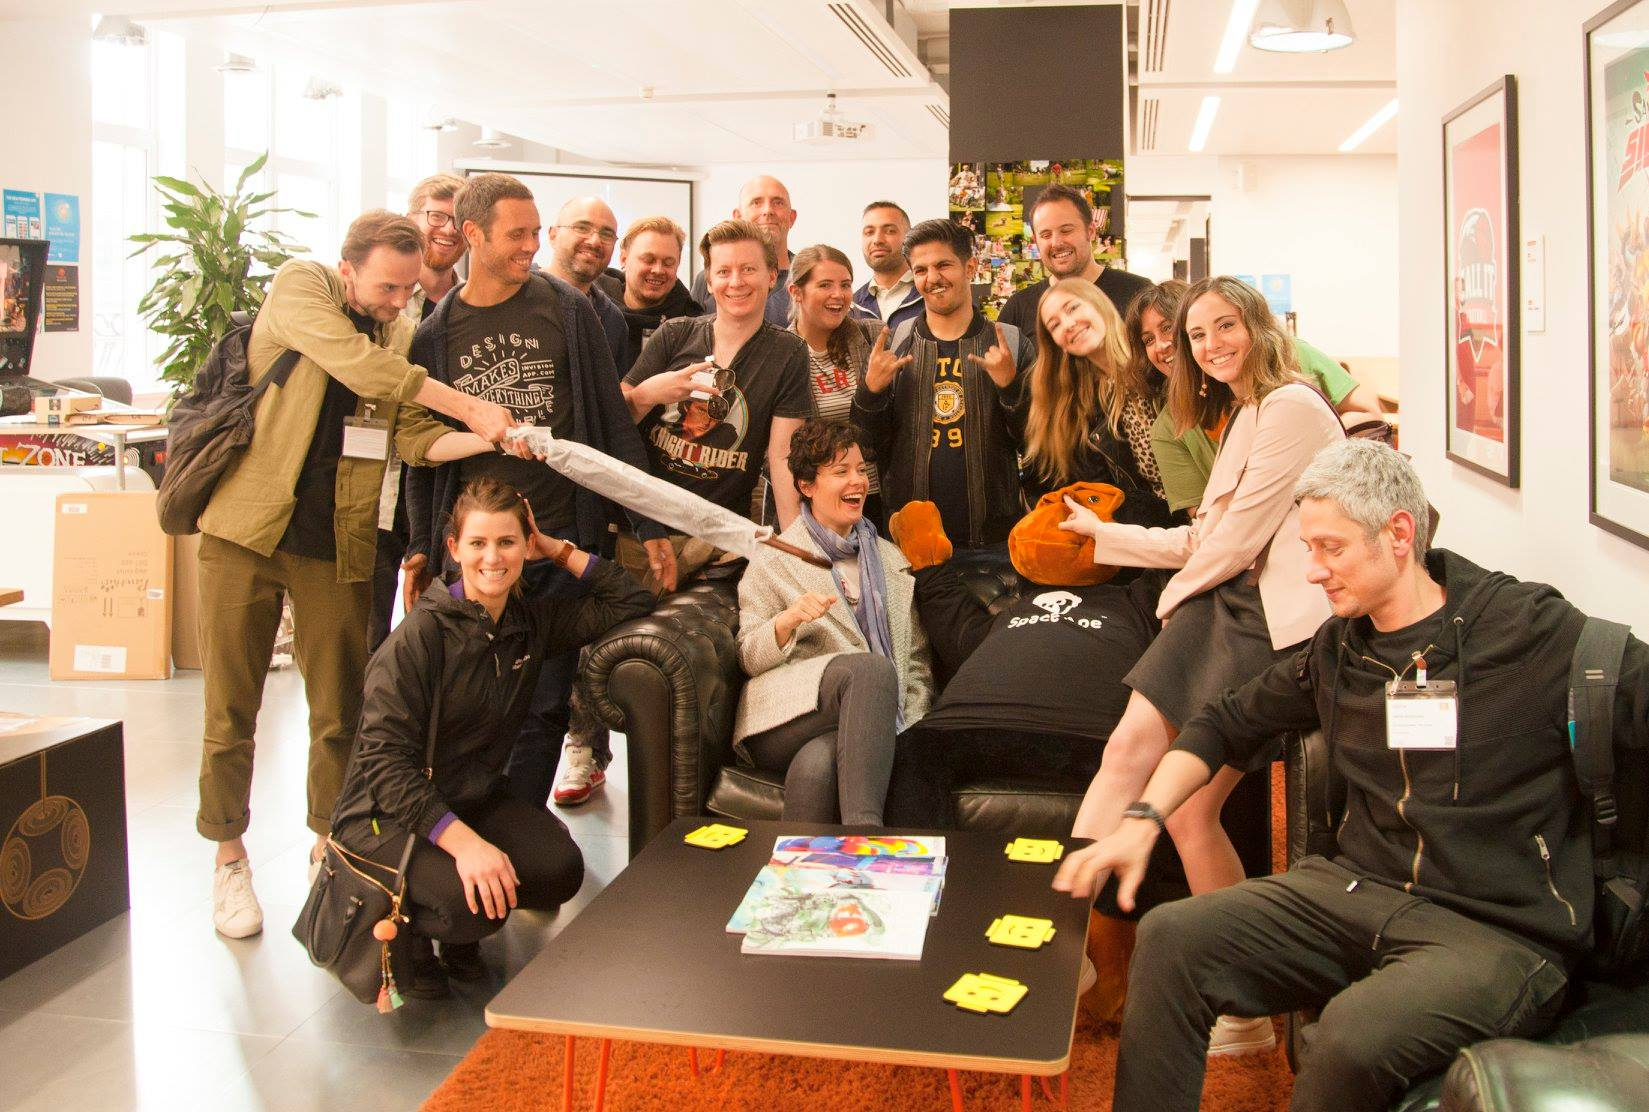 FLA: UX and Digital Design Week, Central London, London, United Kingdom